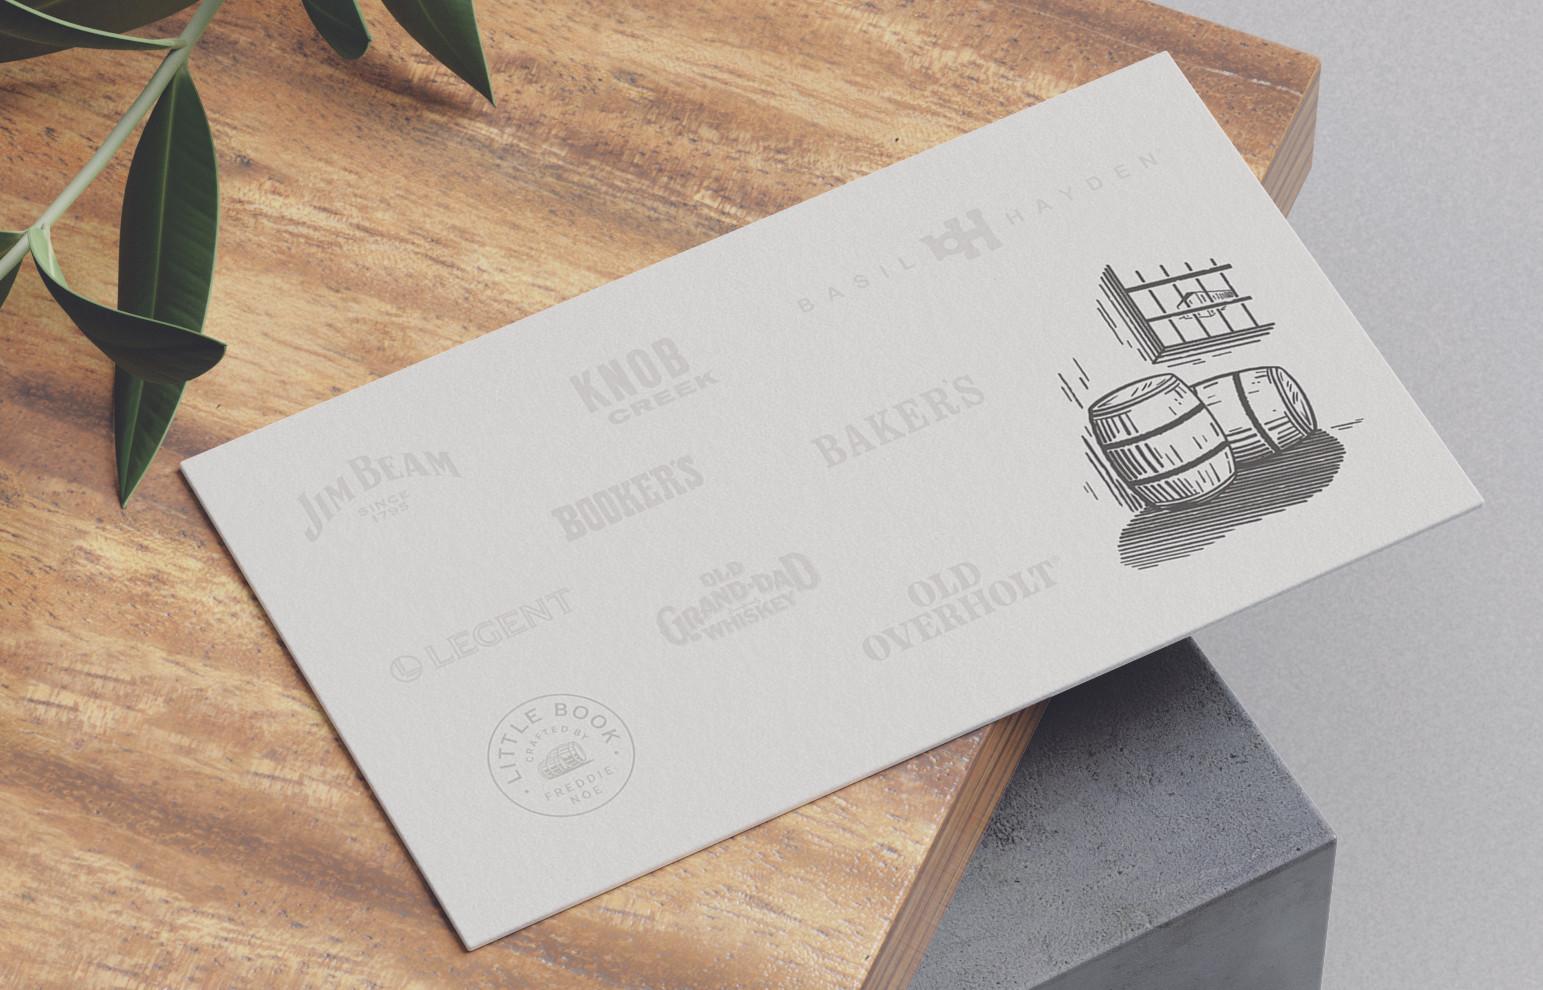 Beam suntory business card back side